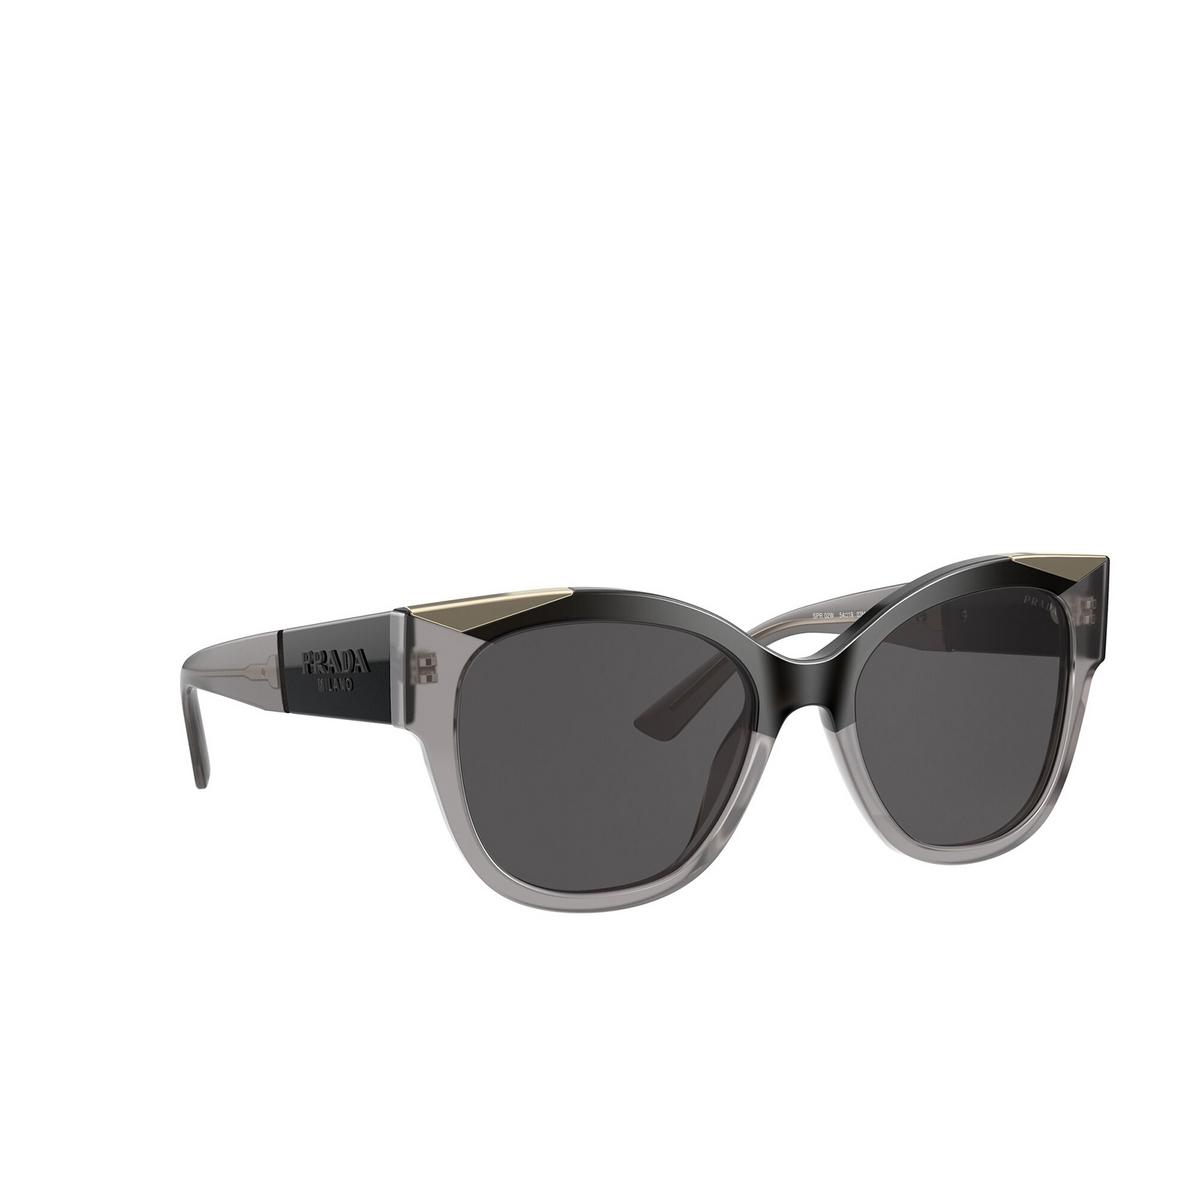 Prada® Butterfly Sunglasses: PR 02WS color Black / Opal Grey 03M5S0 - three-quarters view.